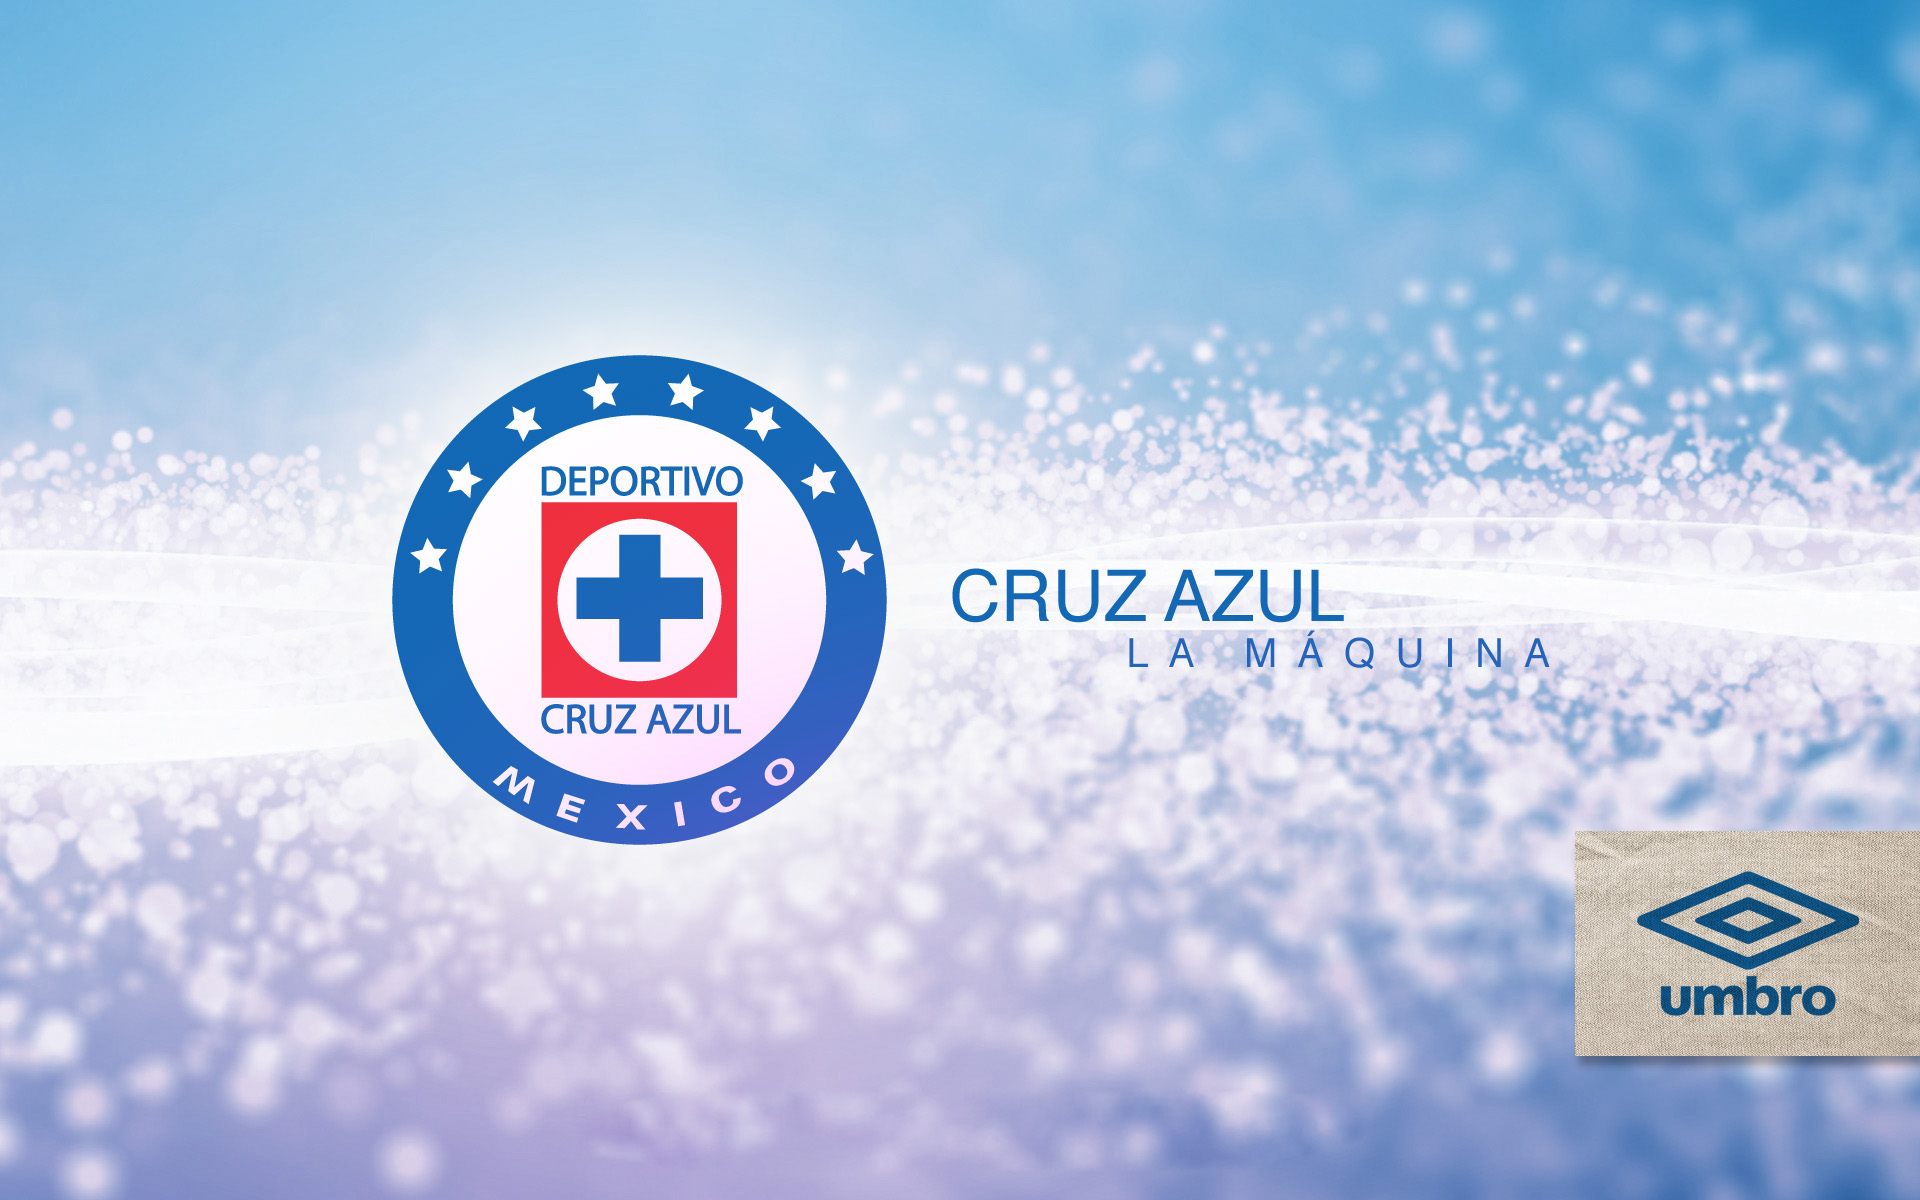 Inspirational Sports Quotes Wallpaper For Iphone Free Cruz Azul Backgrounds Pixelstalk Net